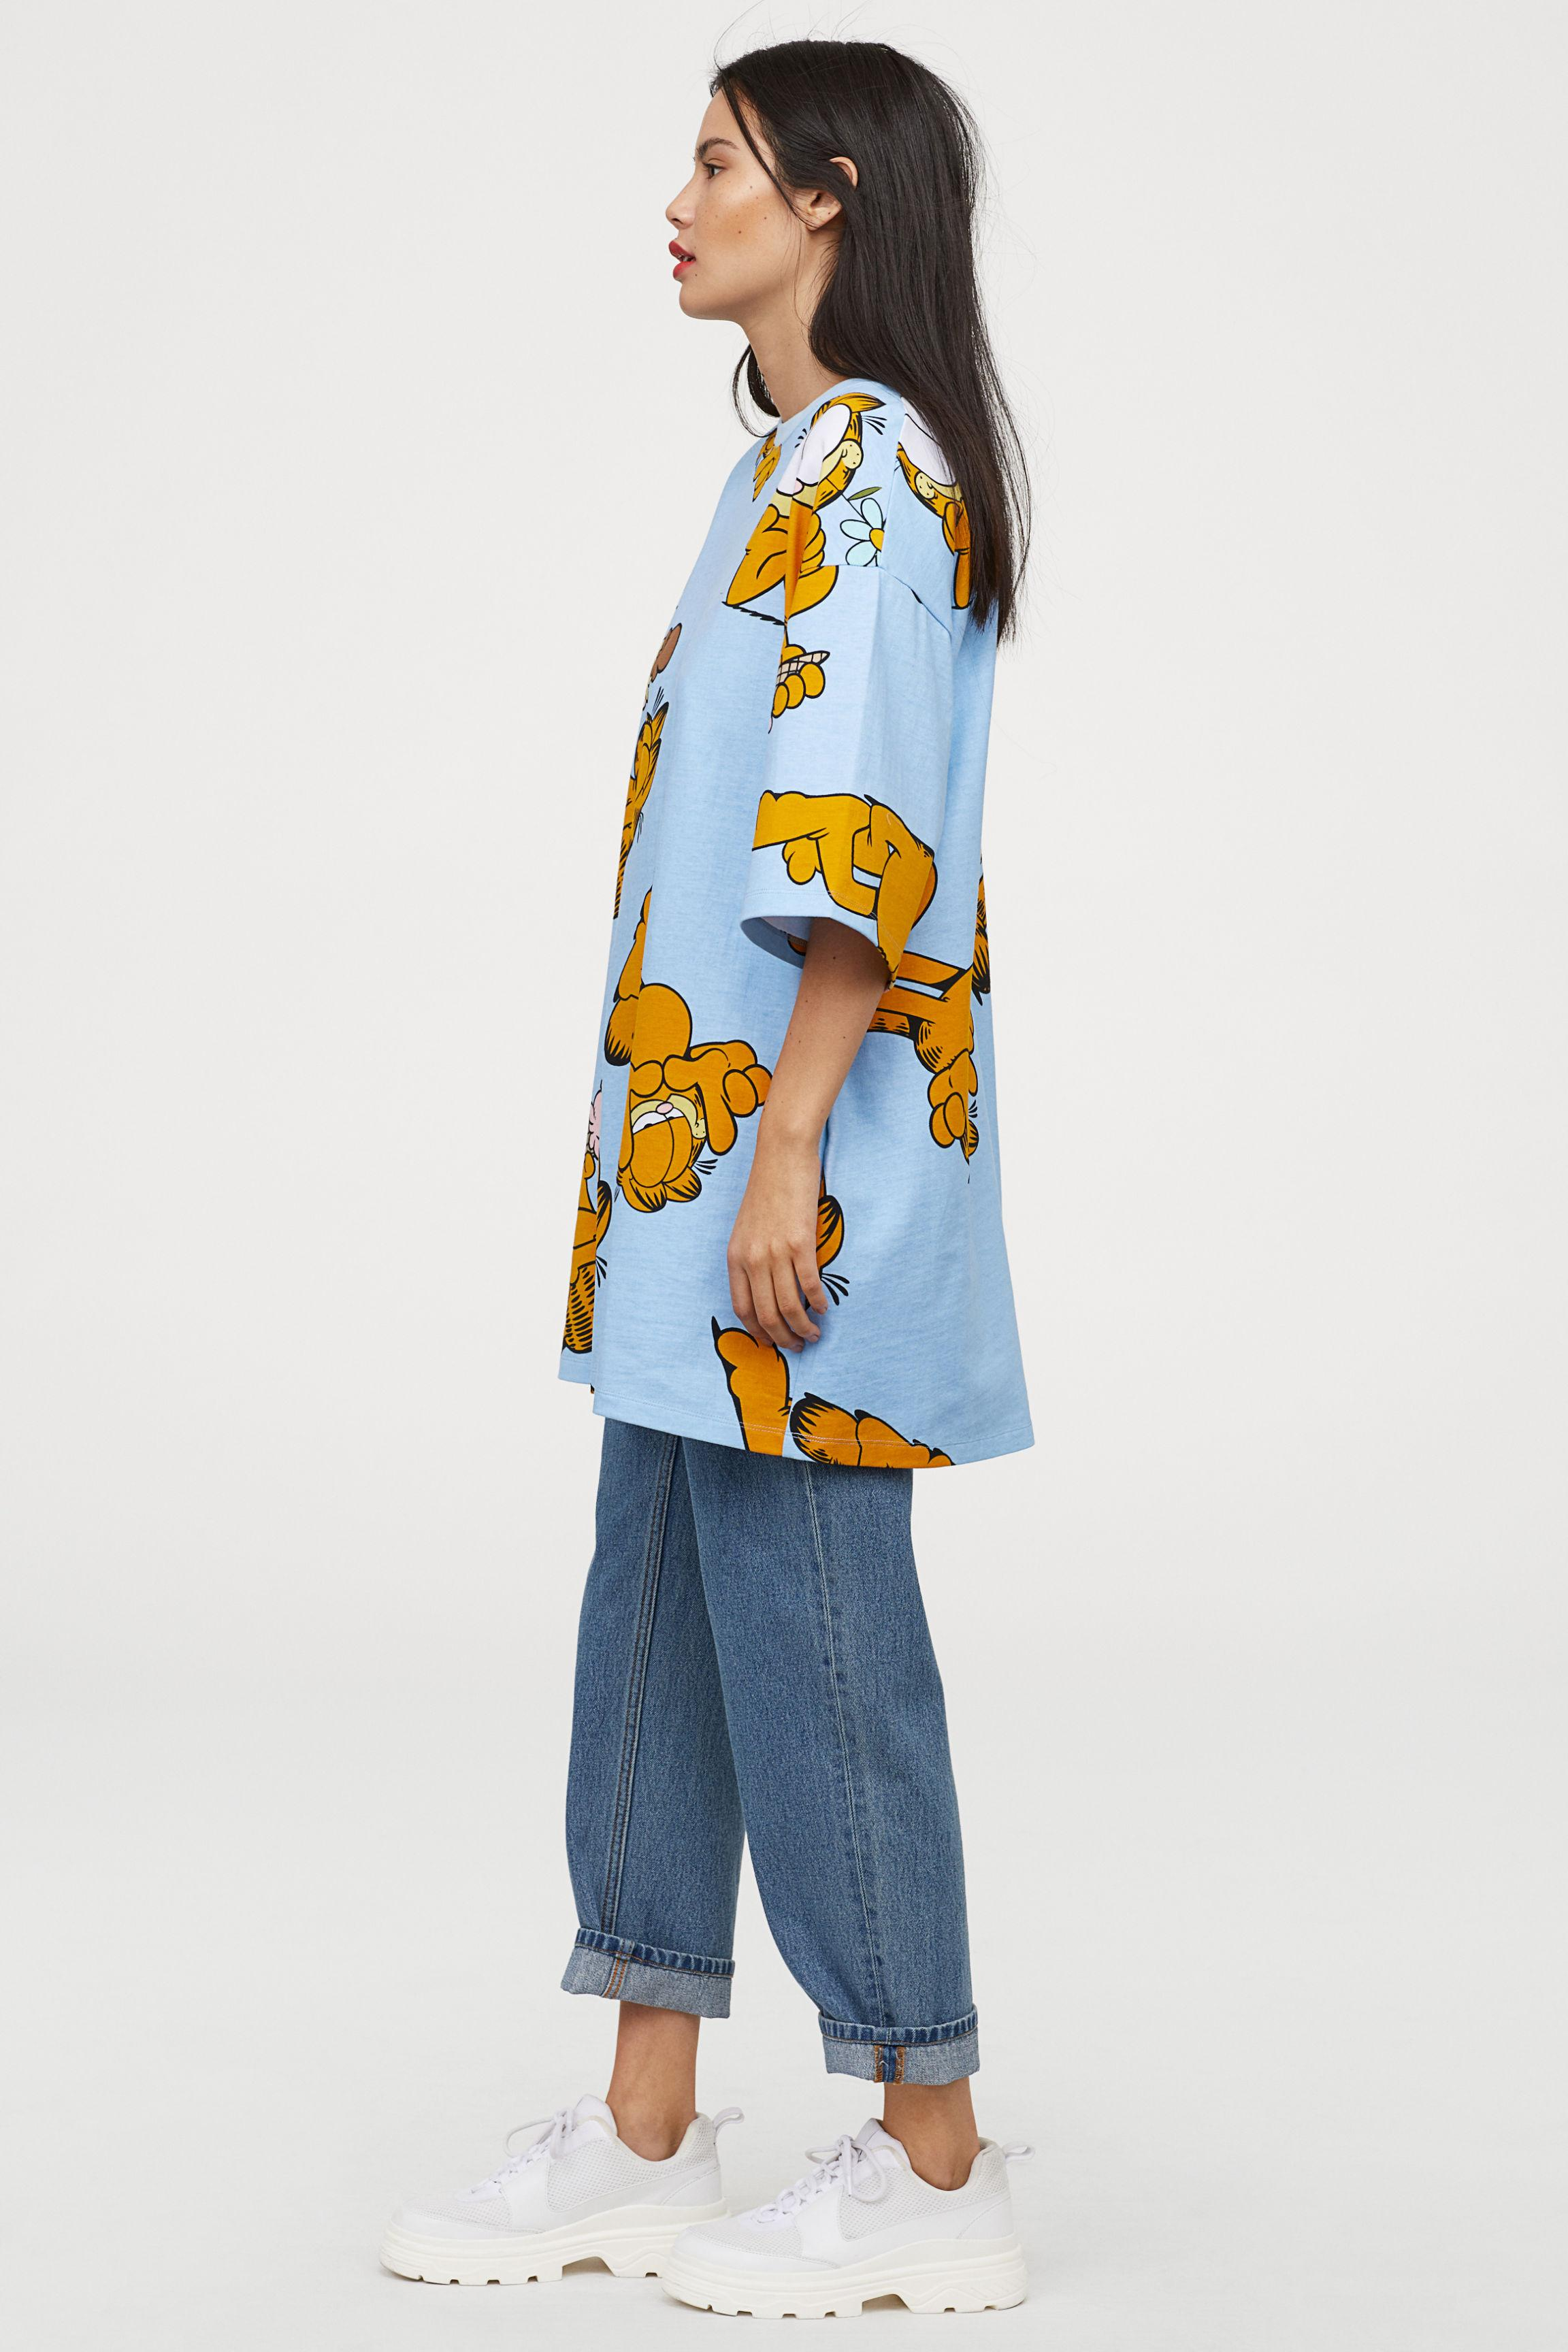 c6331589d0ae H&M Wide T-shirt Dress in Blue - Lyst